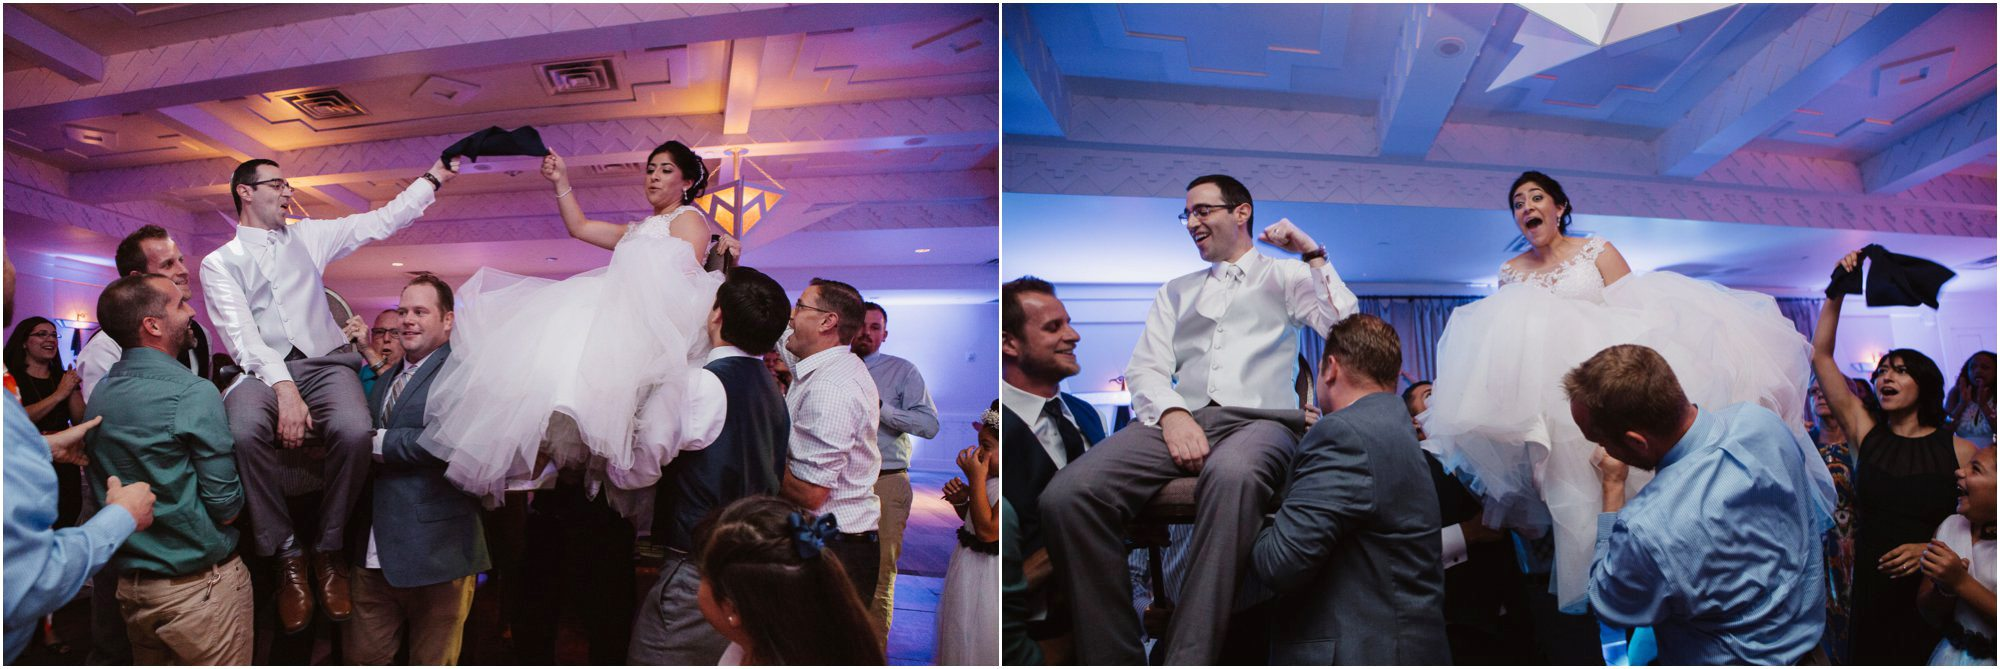 0046albuquerque-wedding-photographer-blue-rose-photography-studio